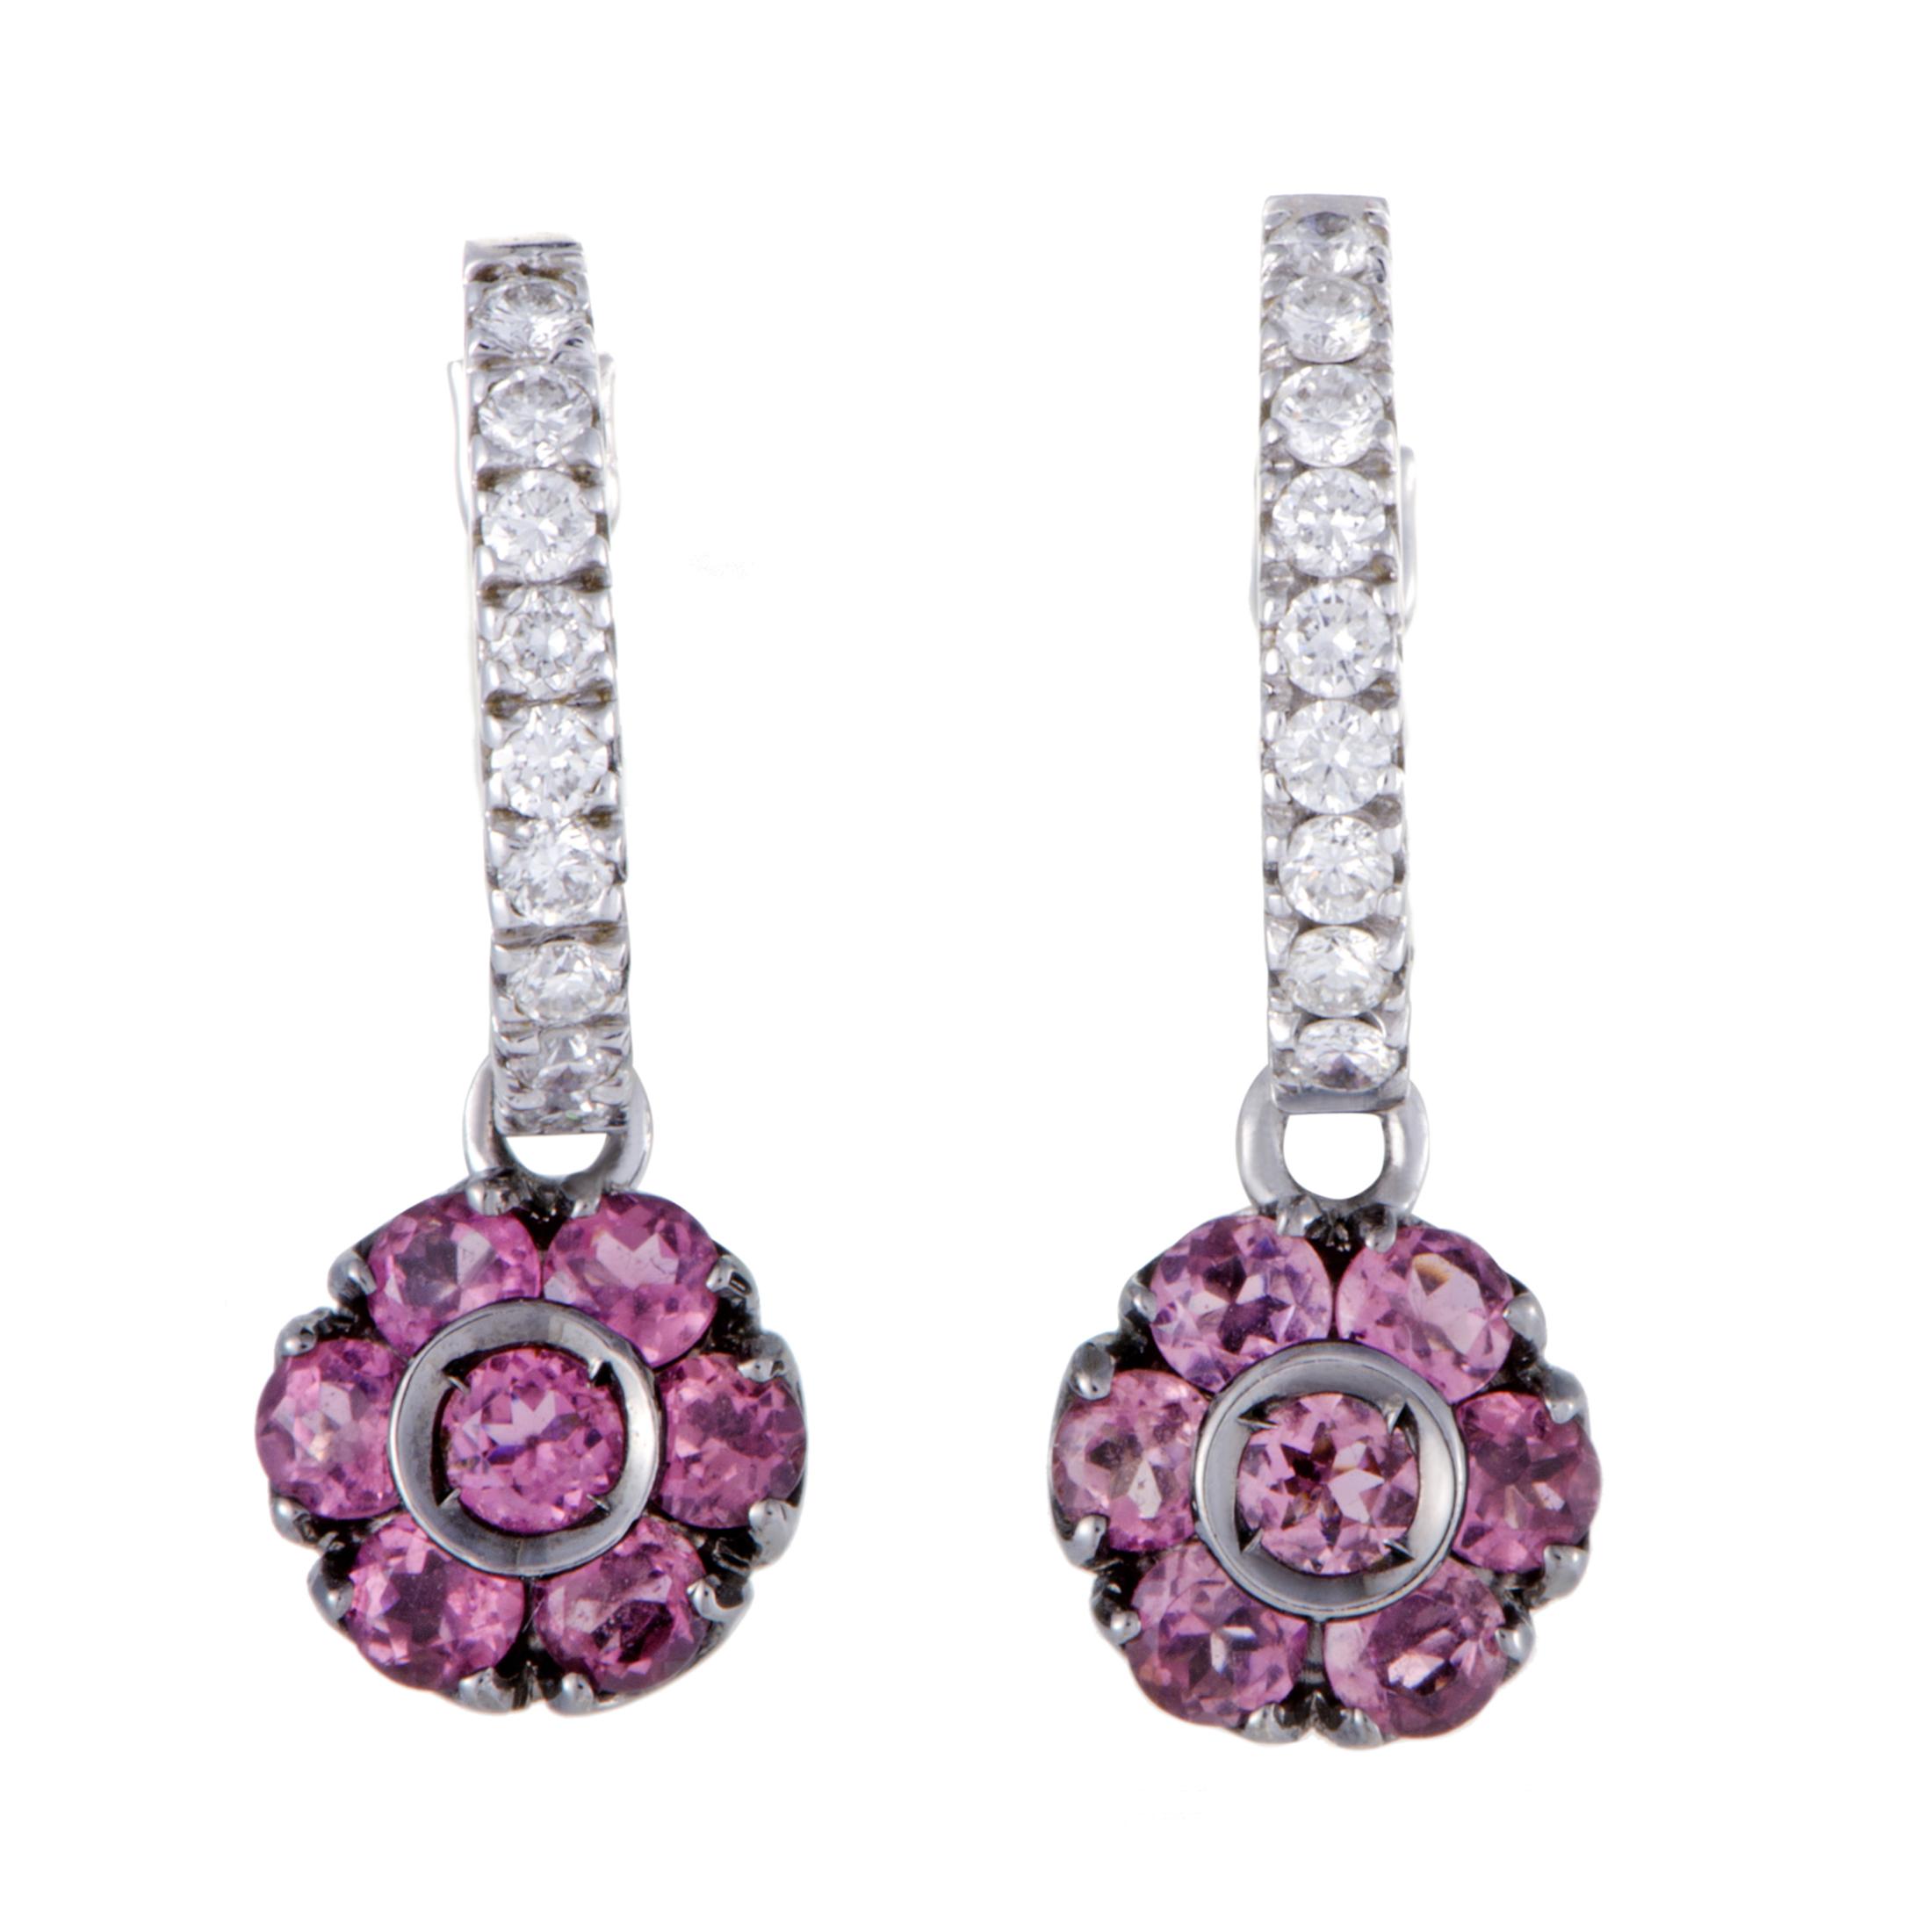 """""Pasquale Bruni Fiori 18K White Gold Diamond and Pink Tourmaline"""""" 1353335"